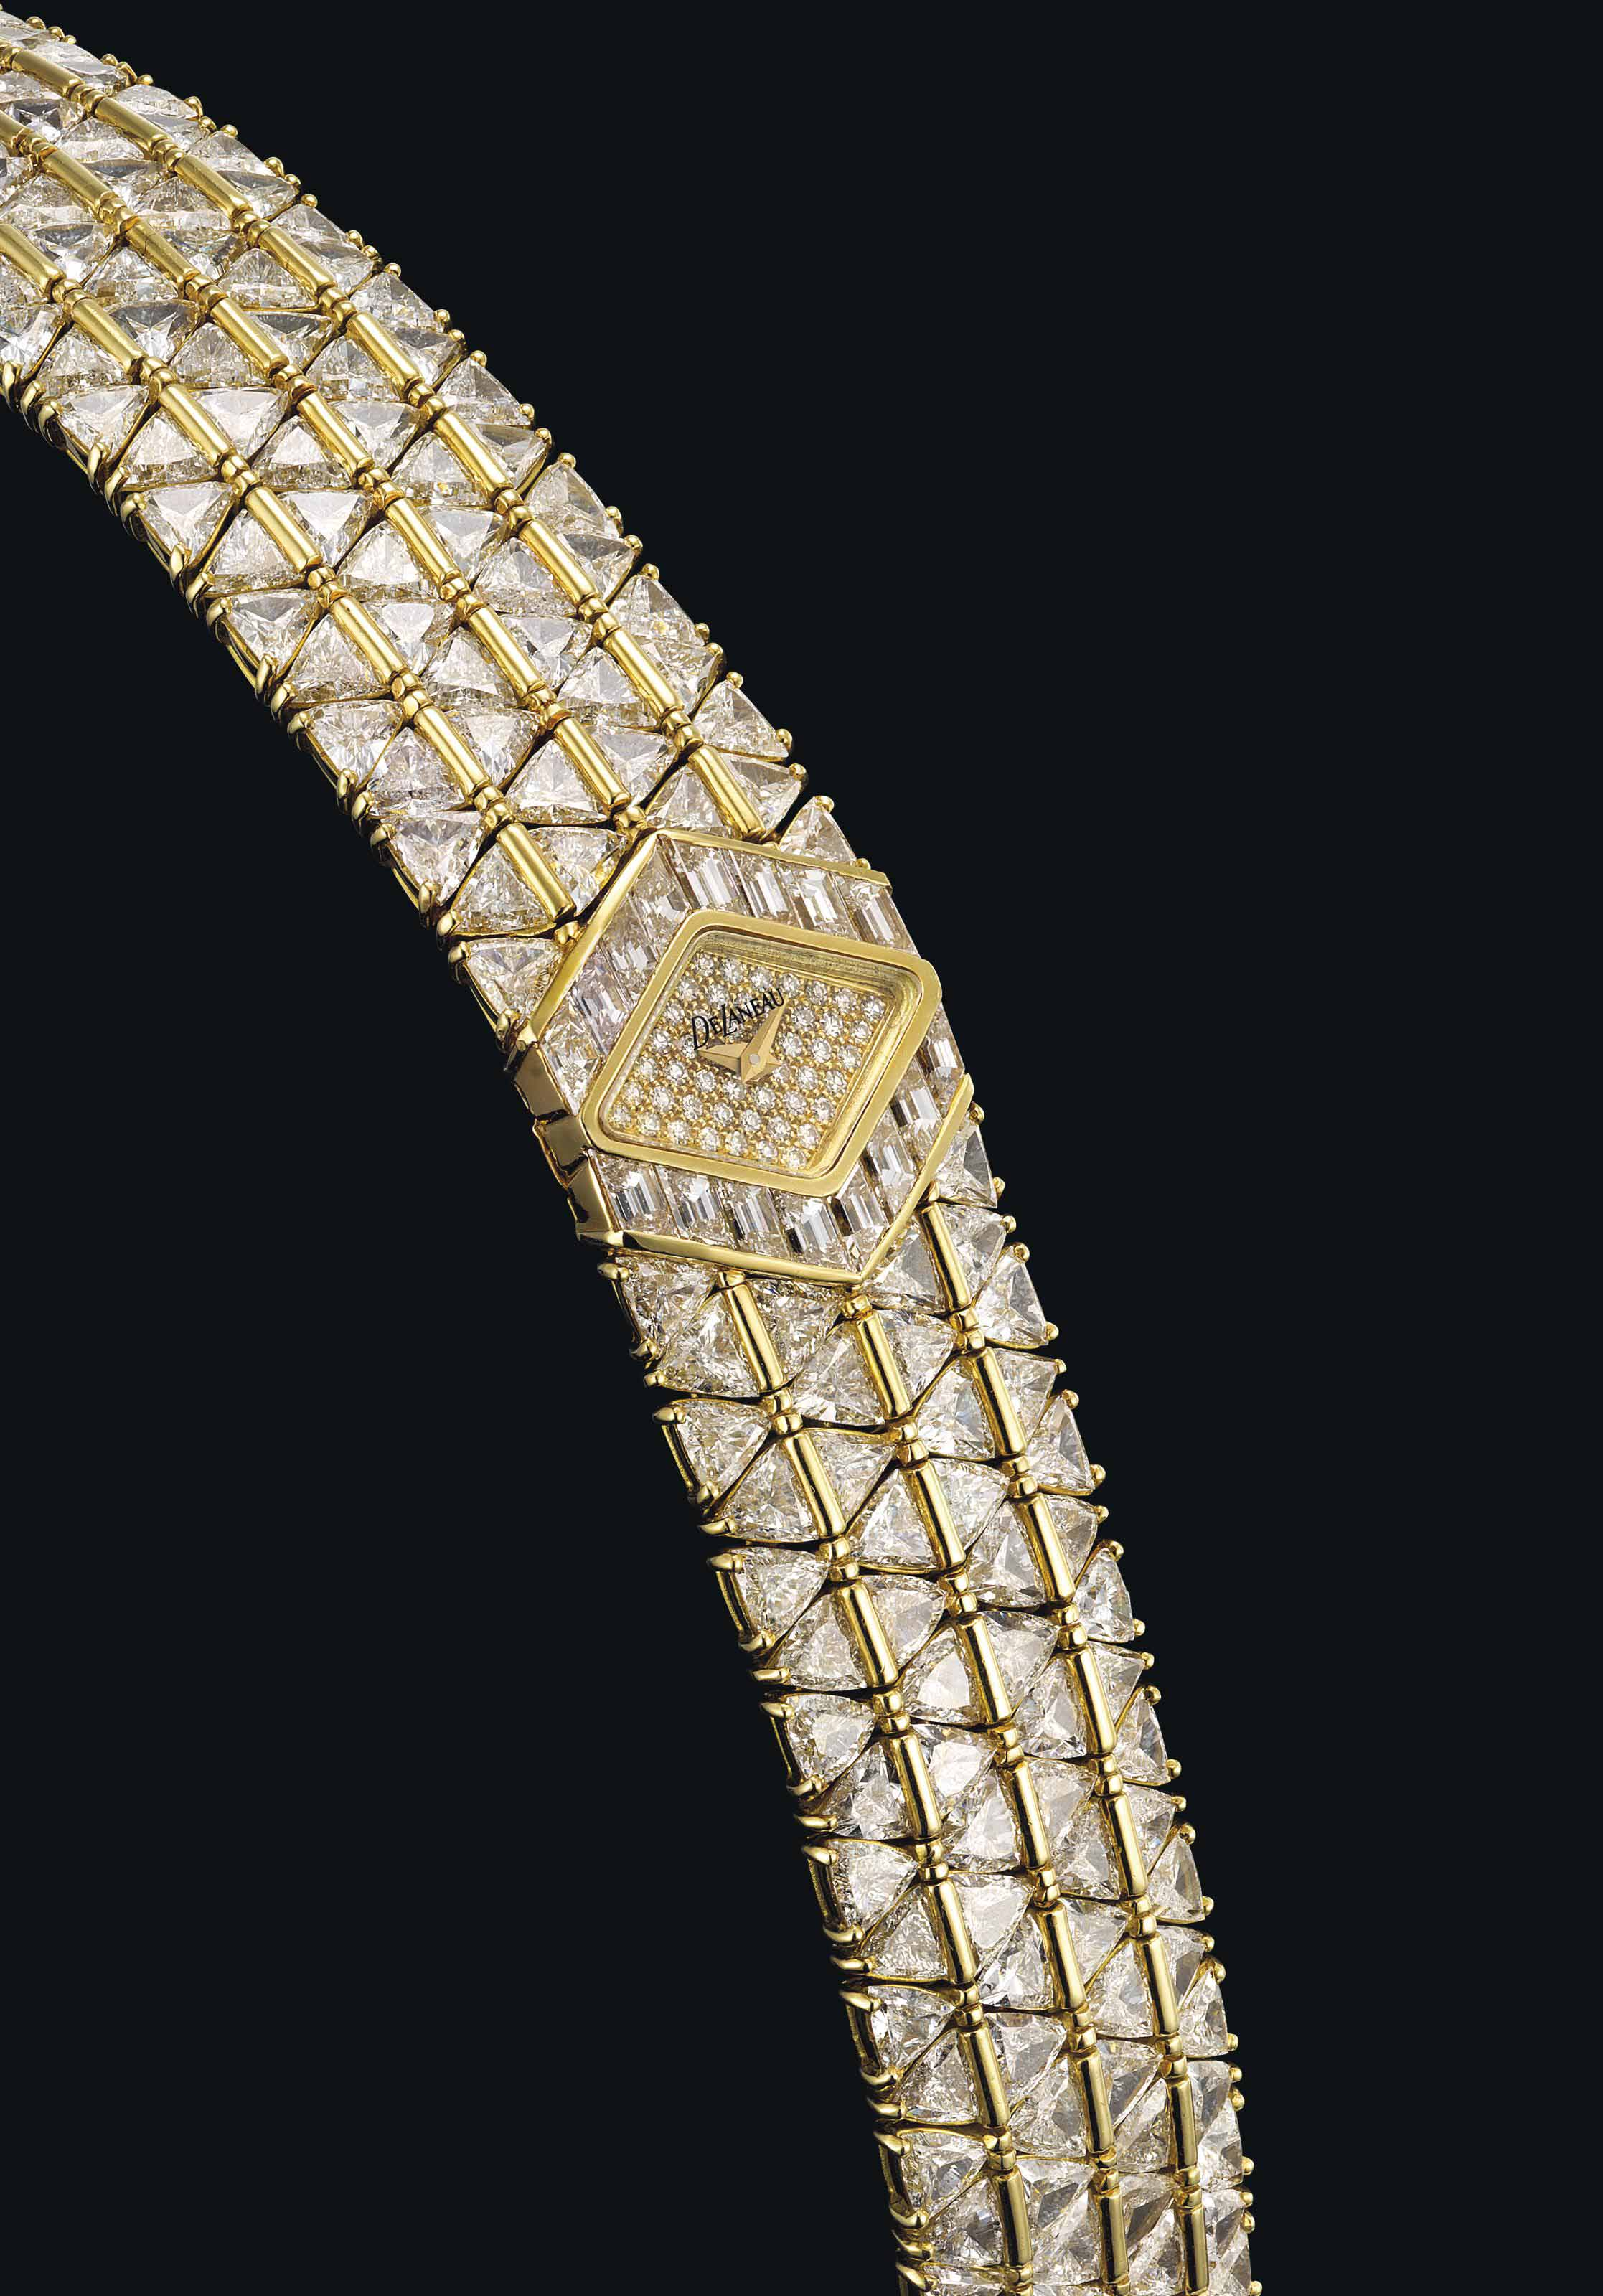 DELANEAU. A LADY'S FINE 18K GOLD AND DIAMOND-SET LOZENGE-SHAPED BRACELET WATCH